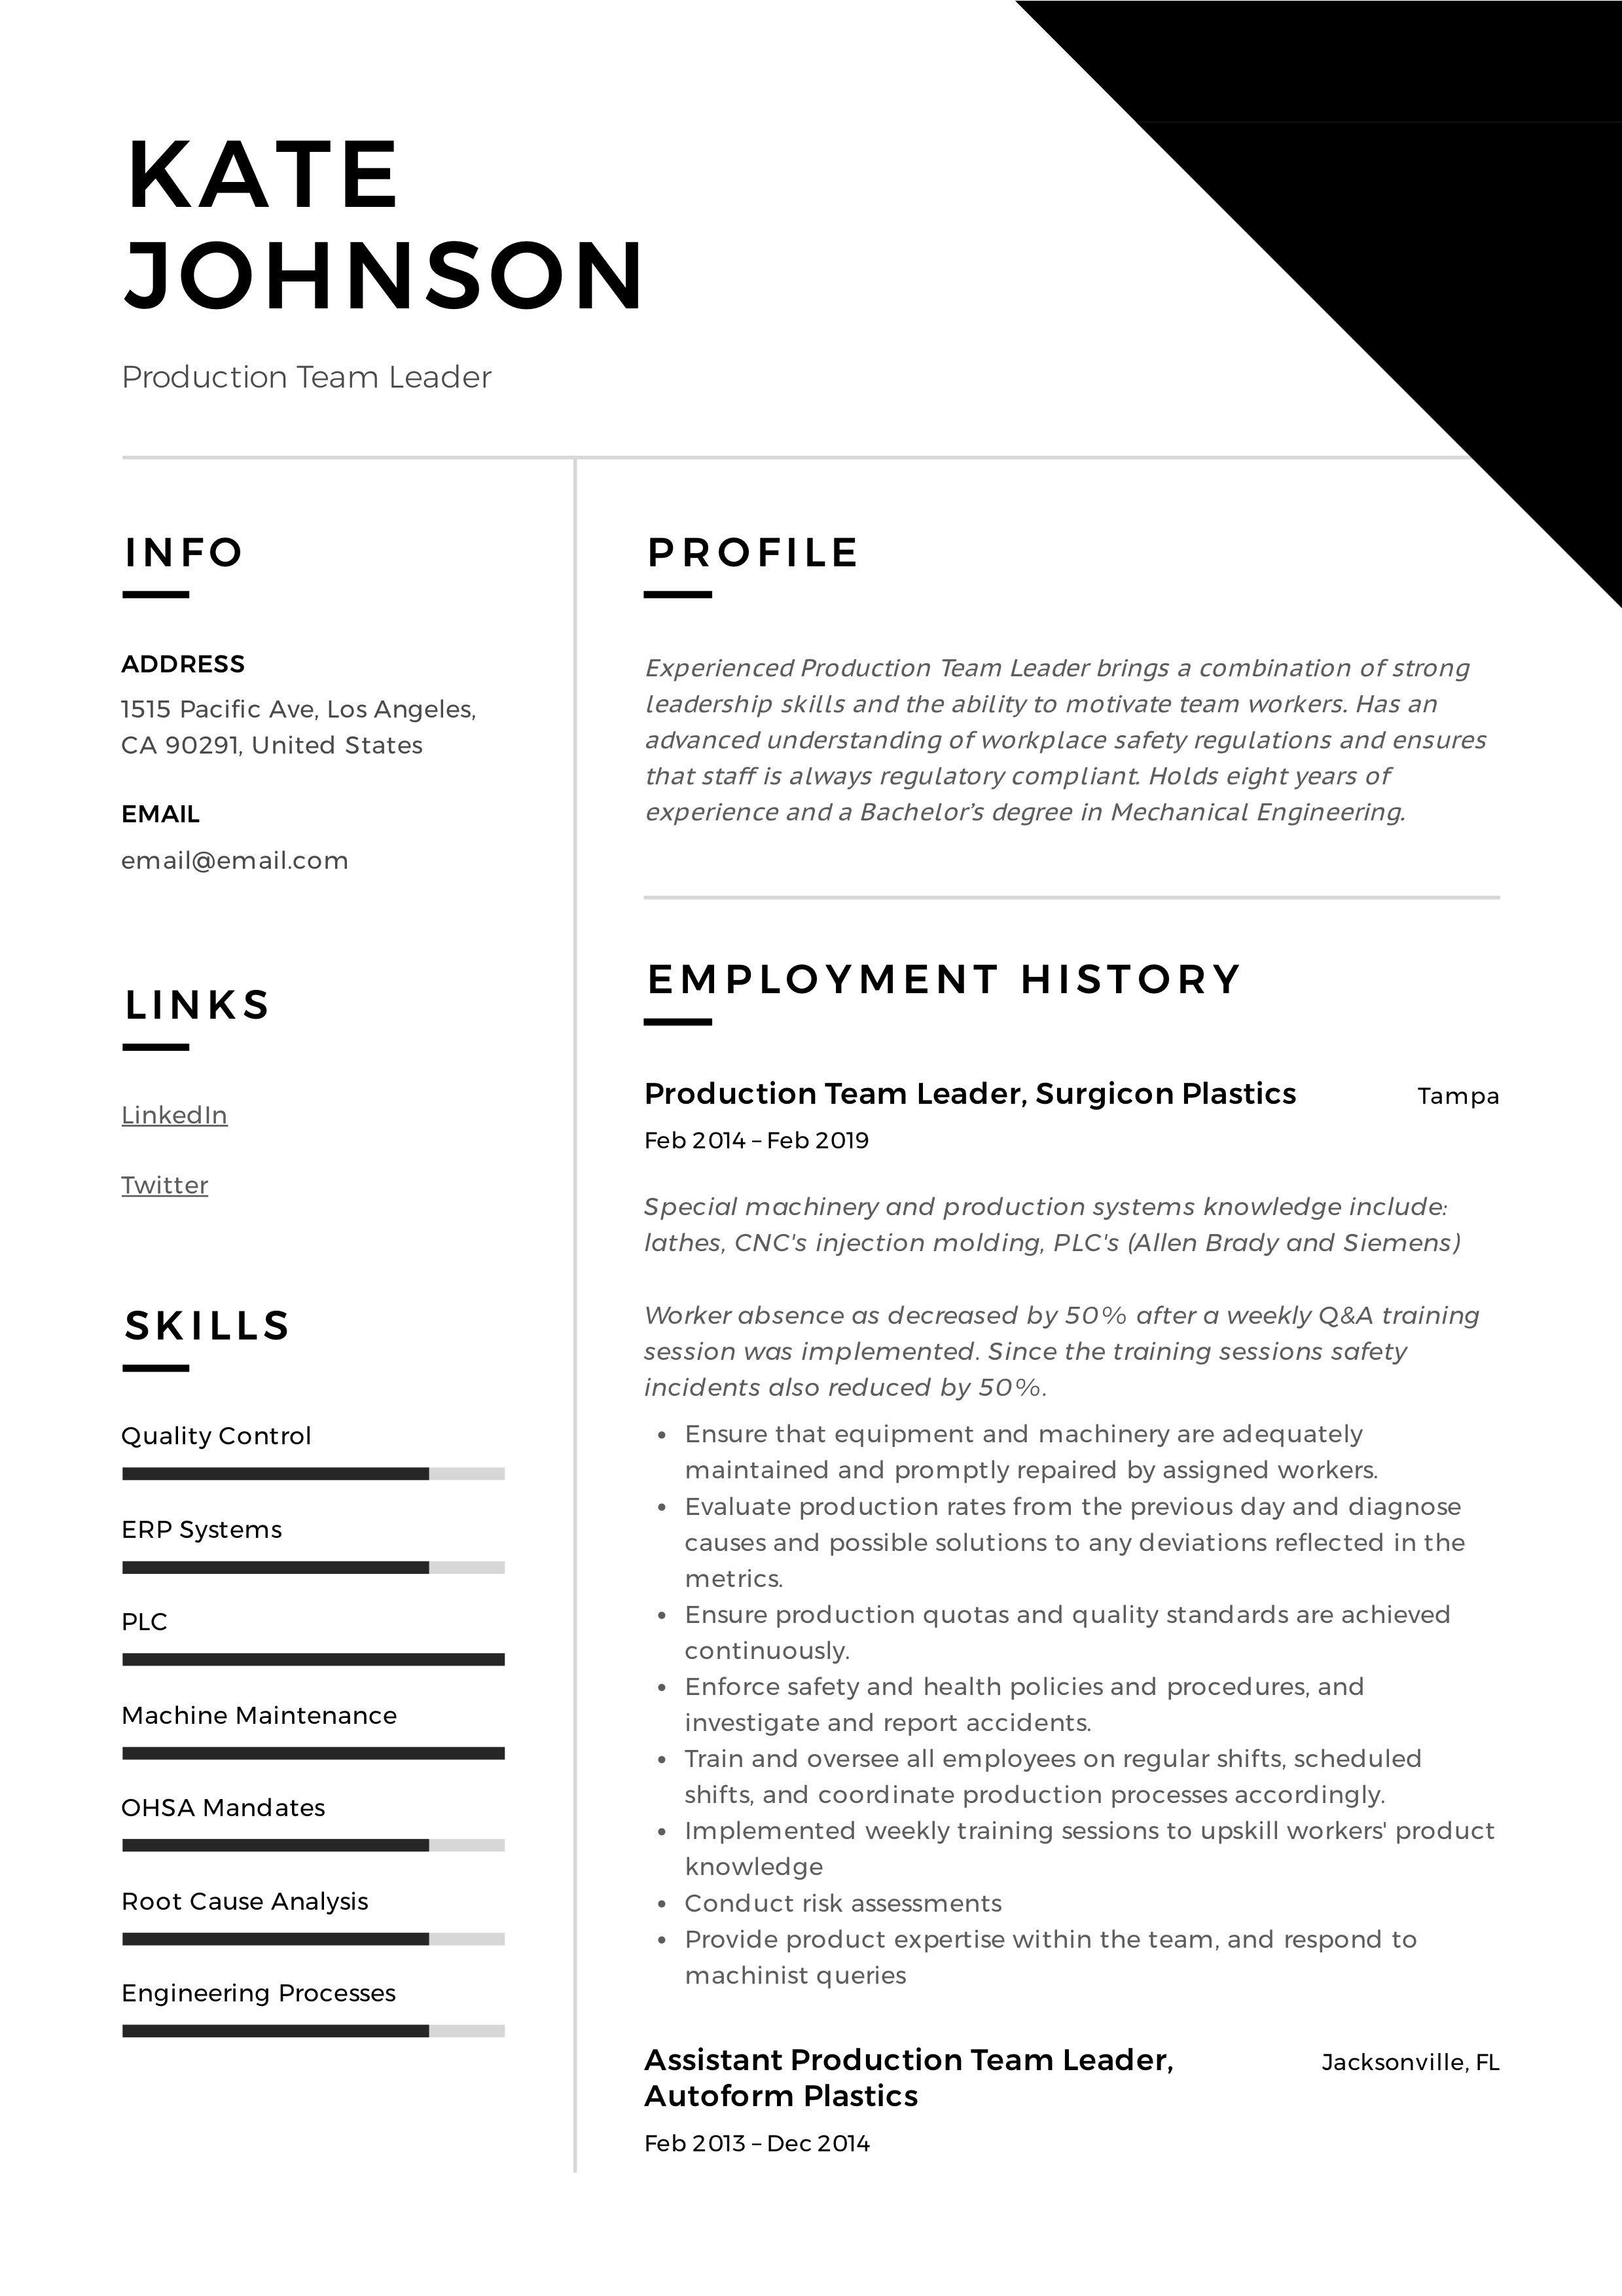 Production Team Leader Resume Template Resume Skills Good Resume Examples Resume Examples